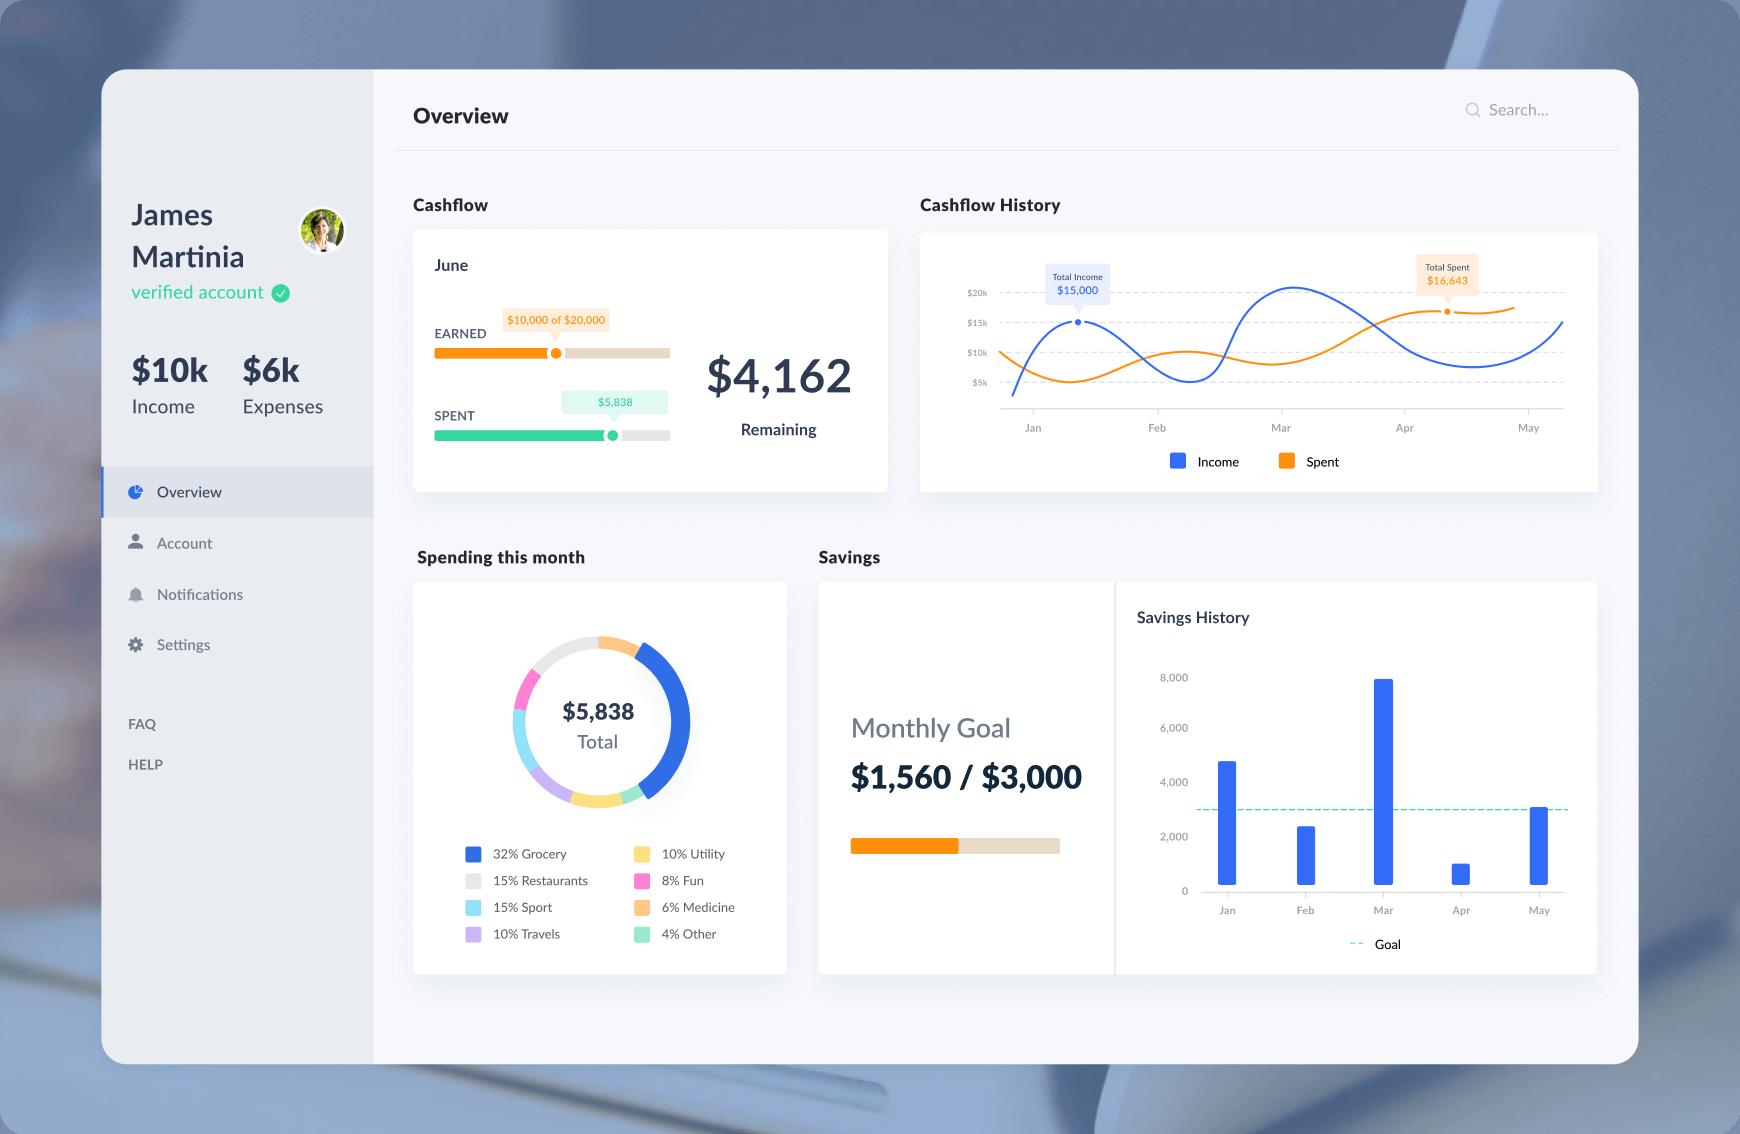 Dashboard screen of financial analytics tool